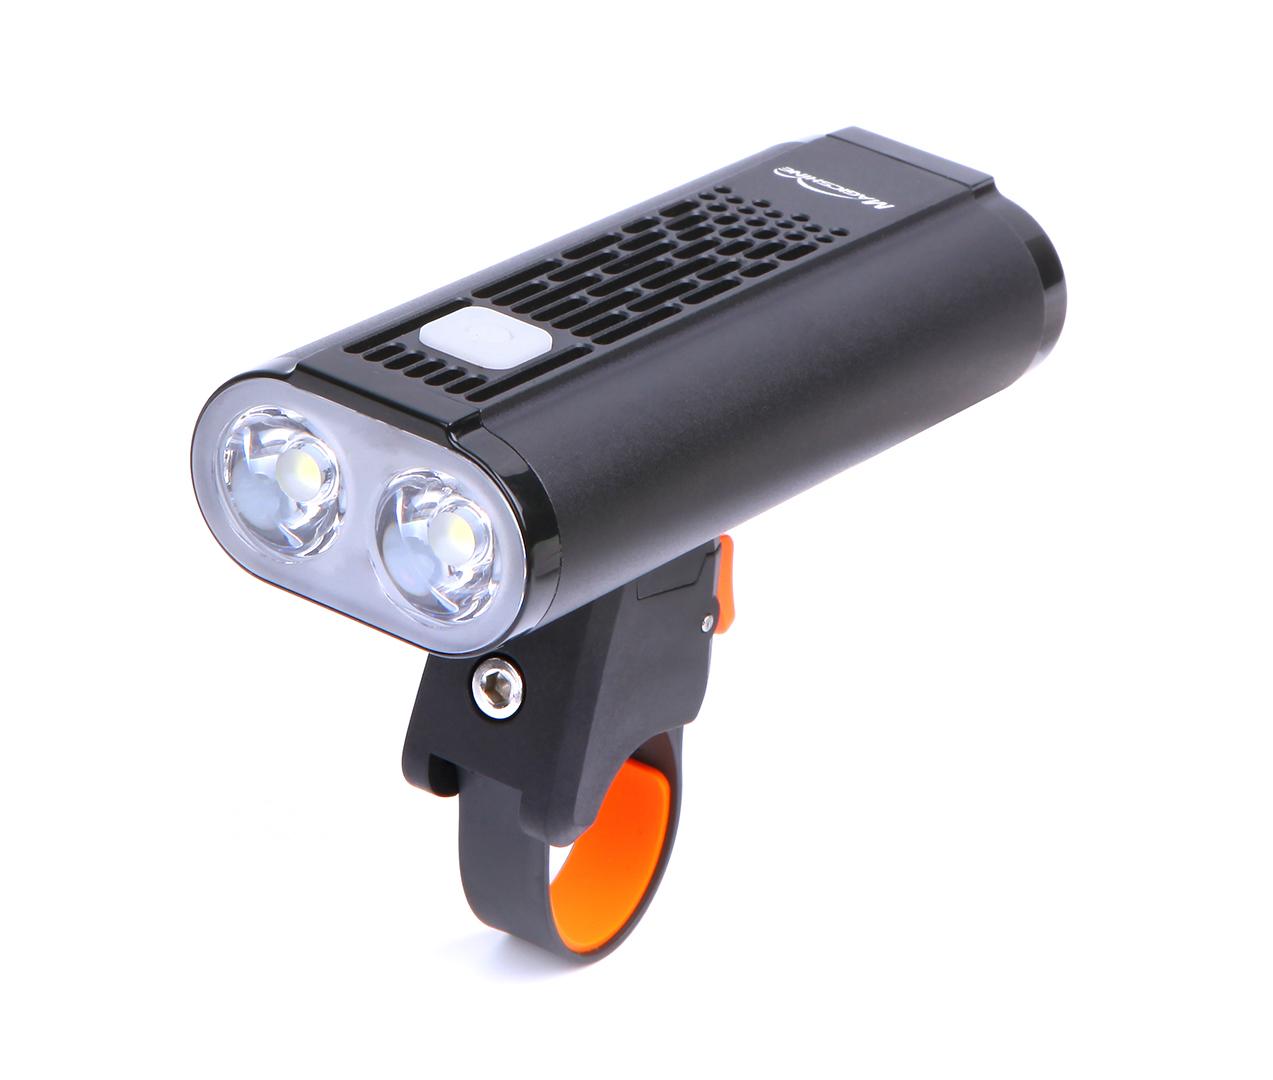 Magicshine - Monteer 1400 - Forlygte - 1400 lumen - USB opladelig | Front lights